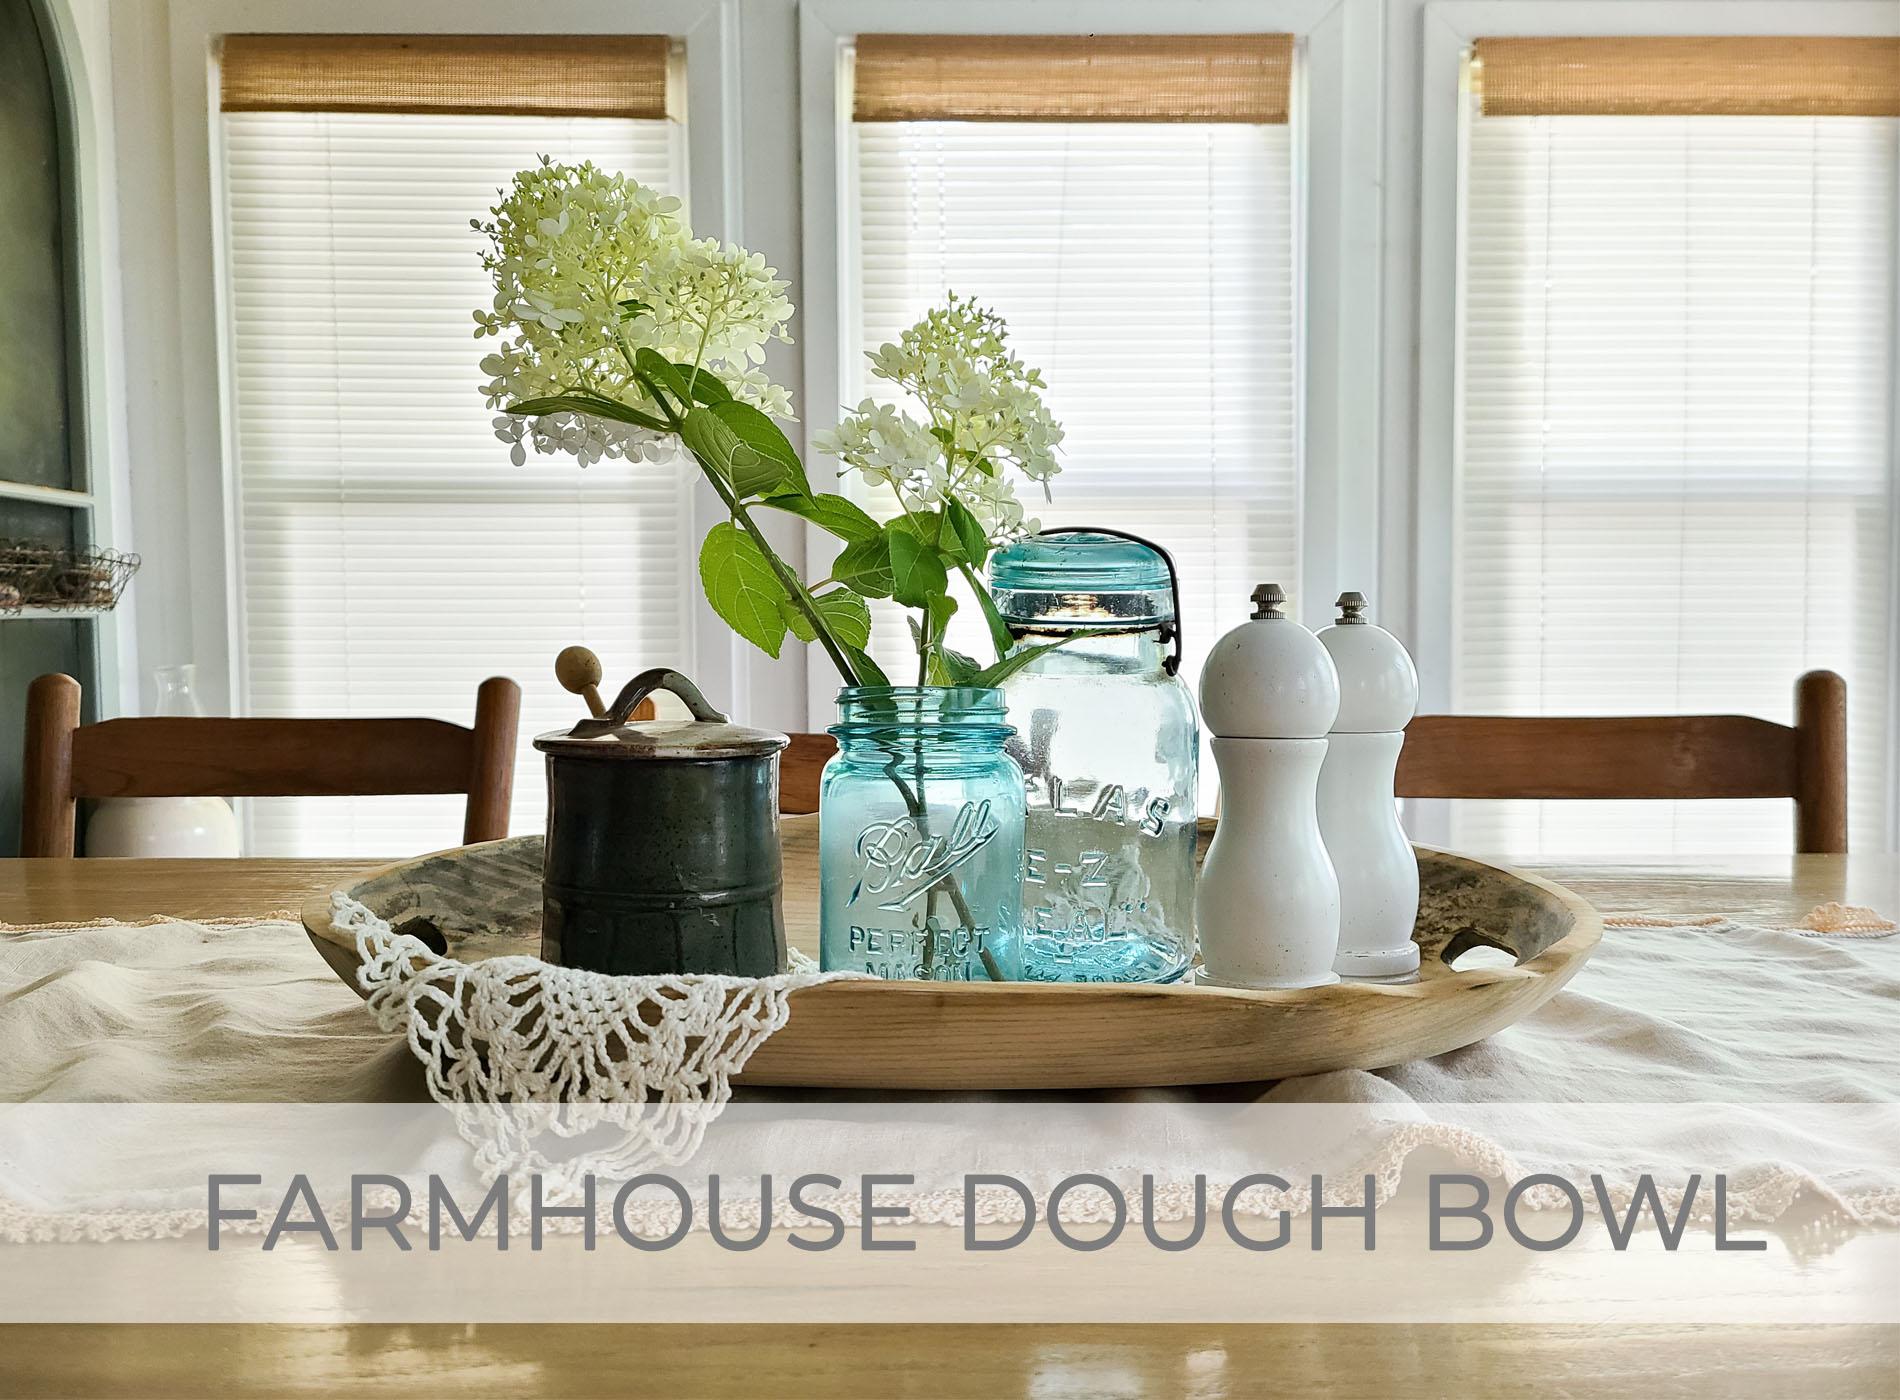 Farmhouse Dough Bowl from Tourist Token by Larissa of Prodigal Pieces | prodigalpieces.com #prodigalpieces